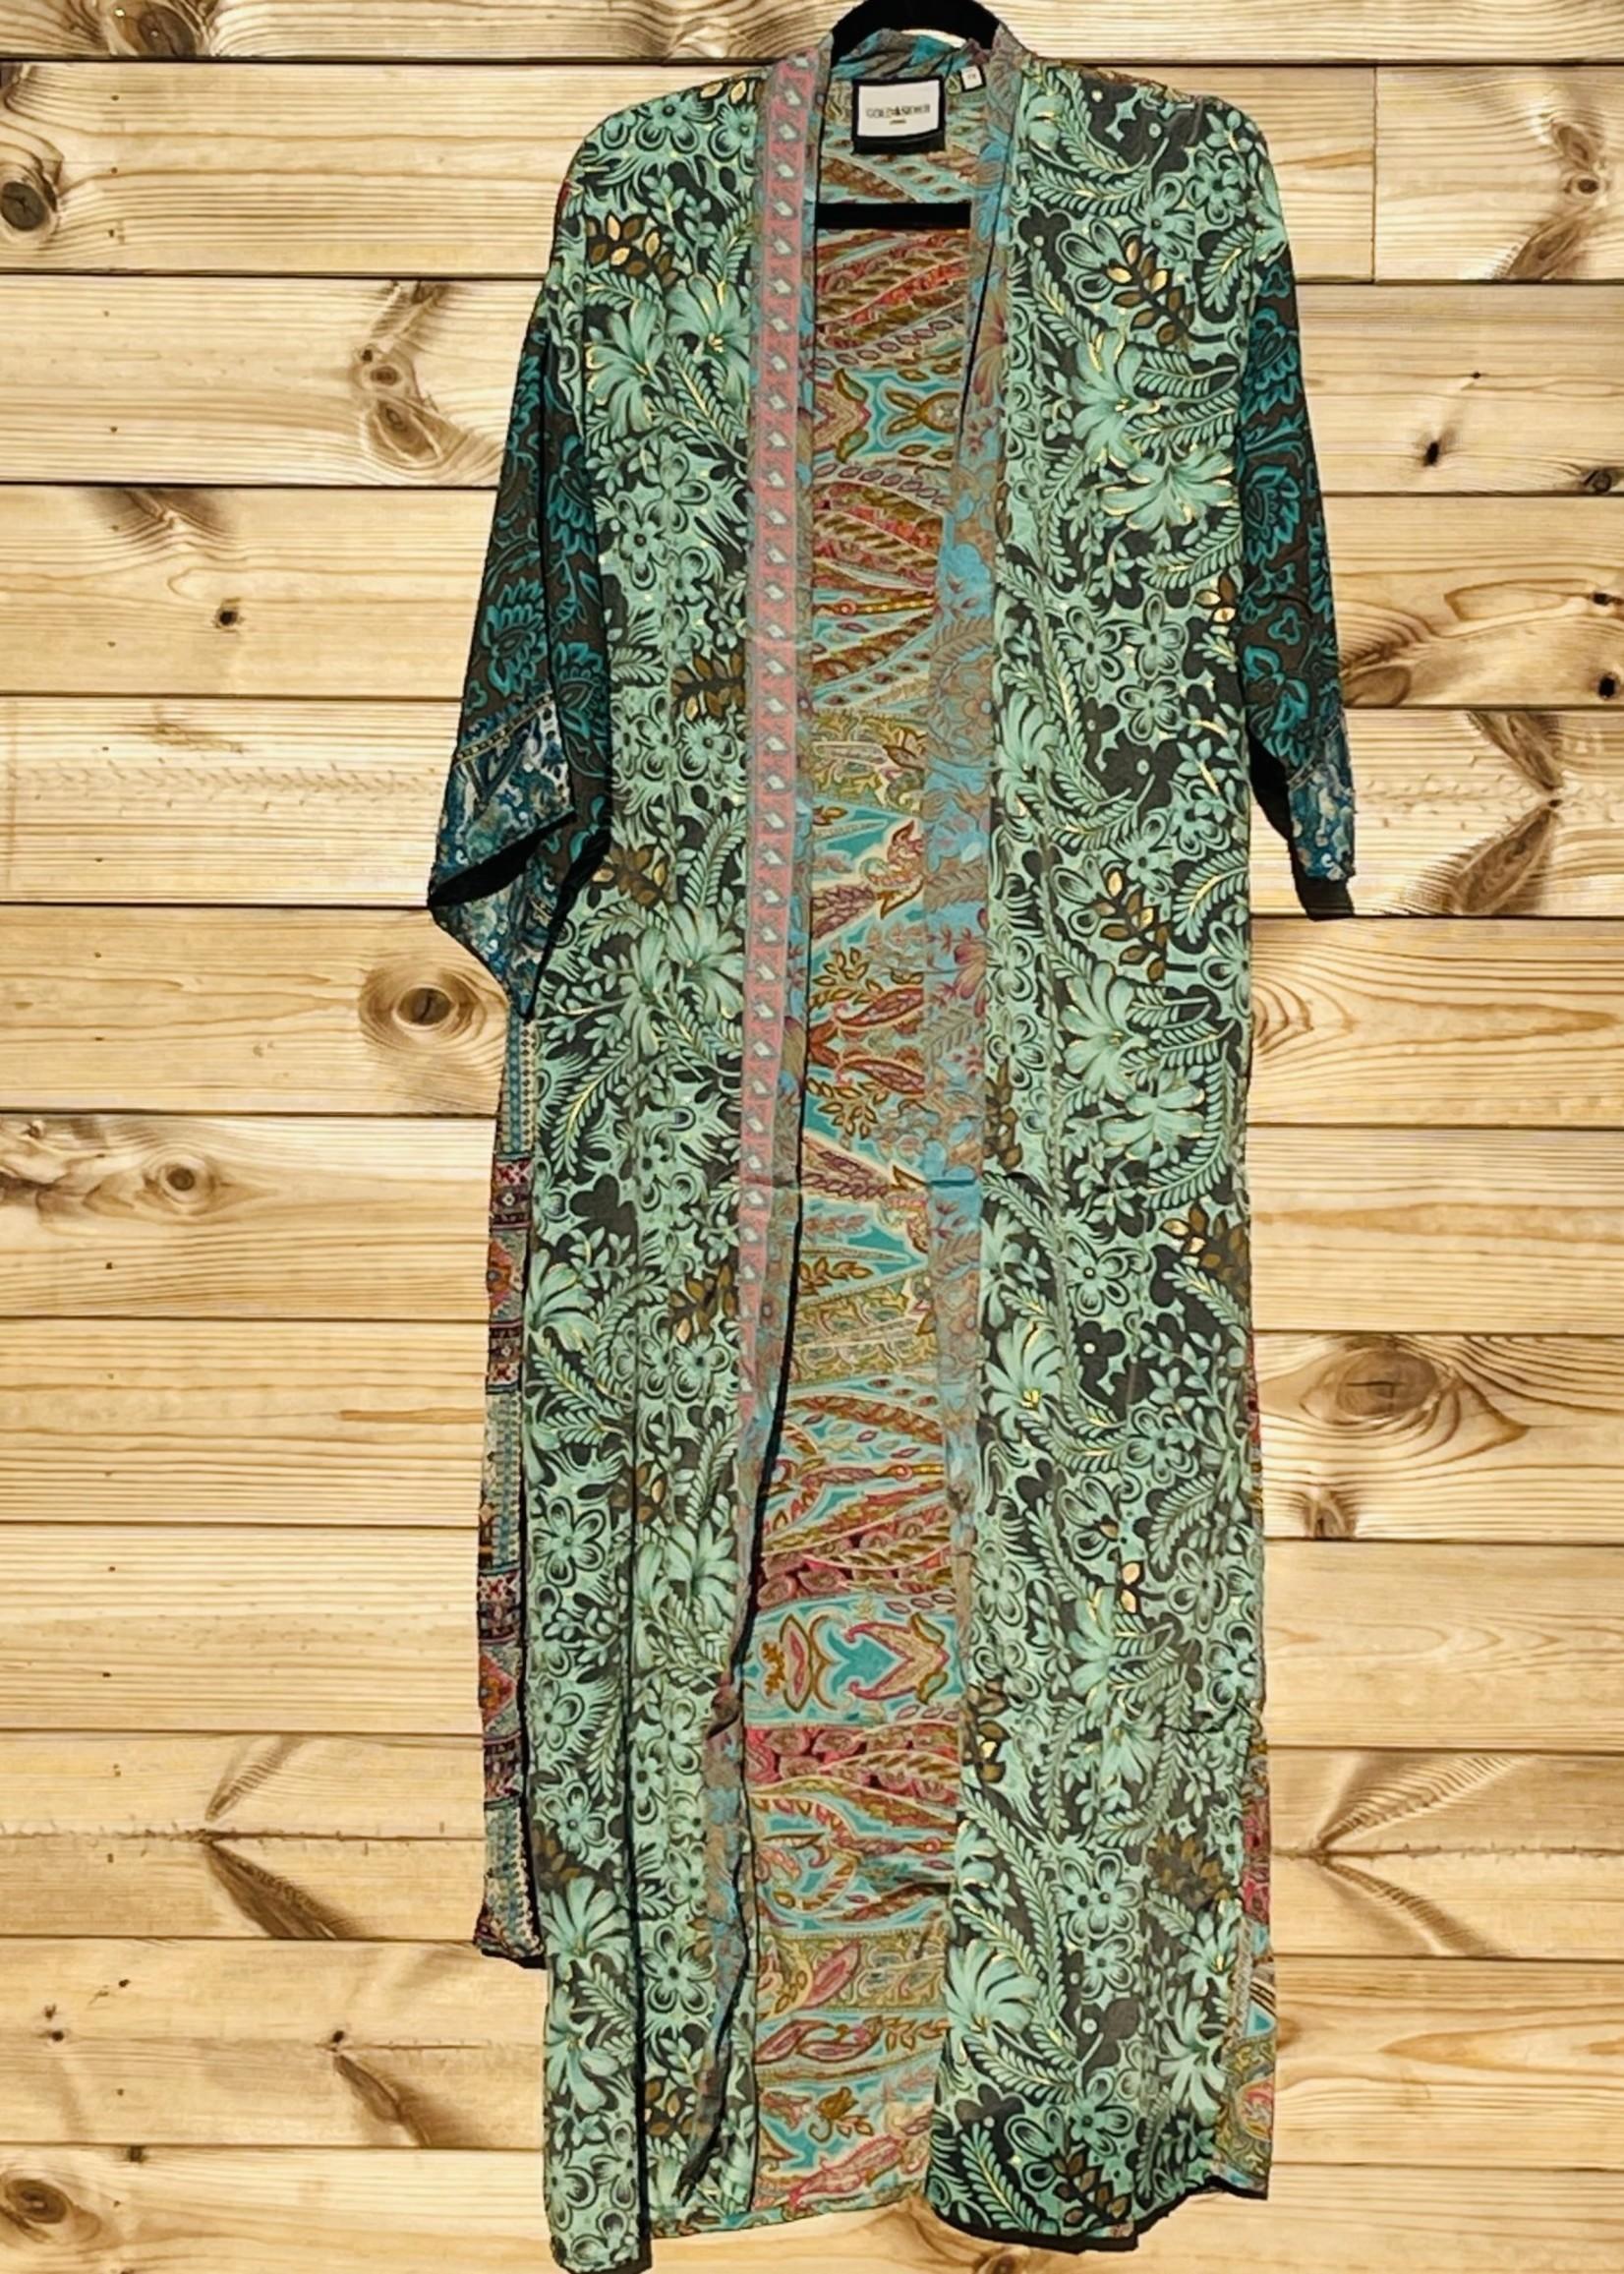 Guts & Goats Kimono Long 111